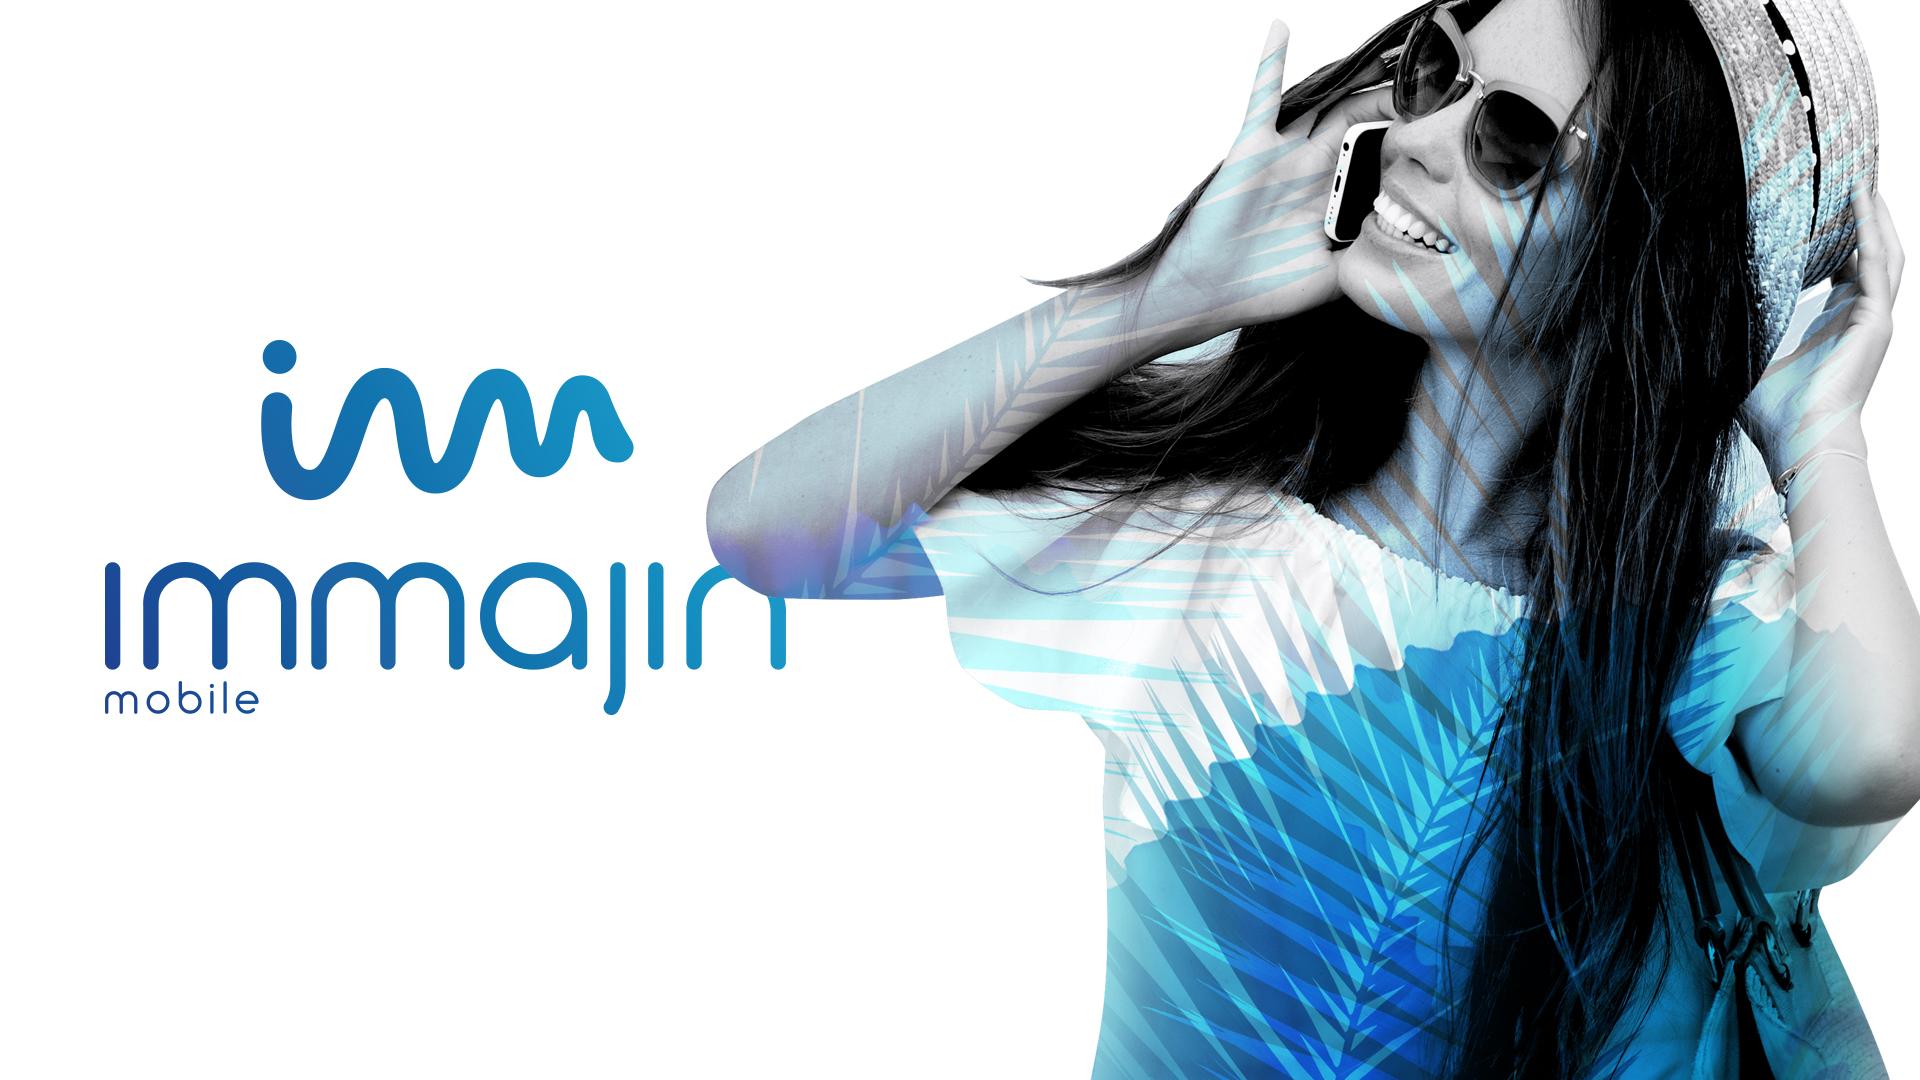 immajin mobile background-3.2